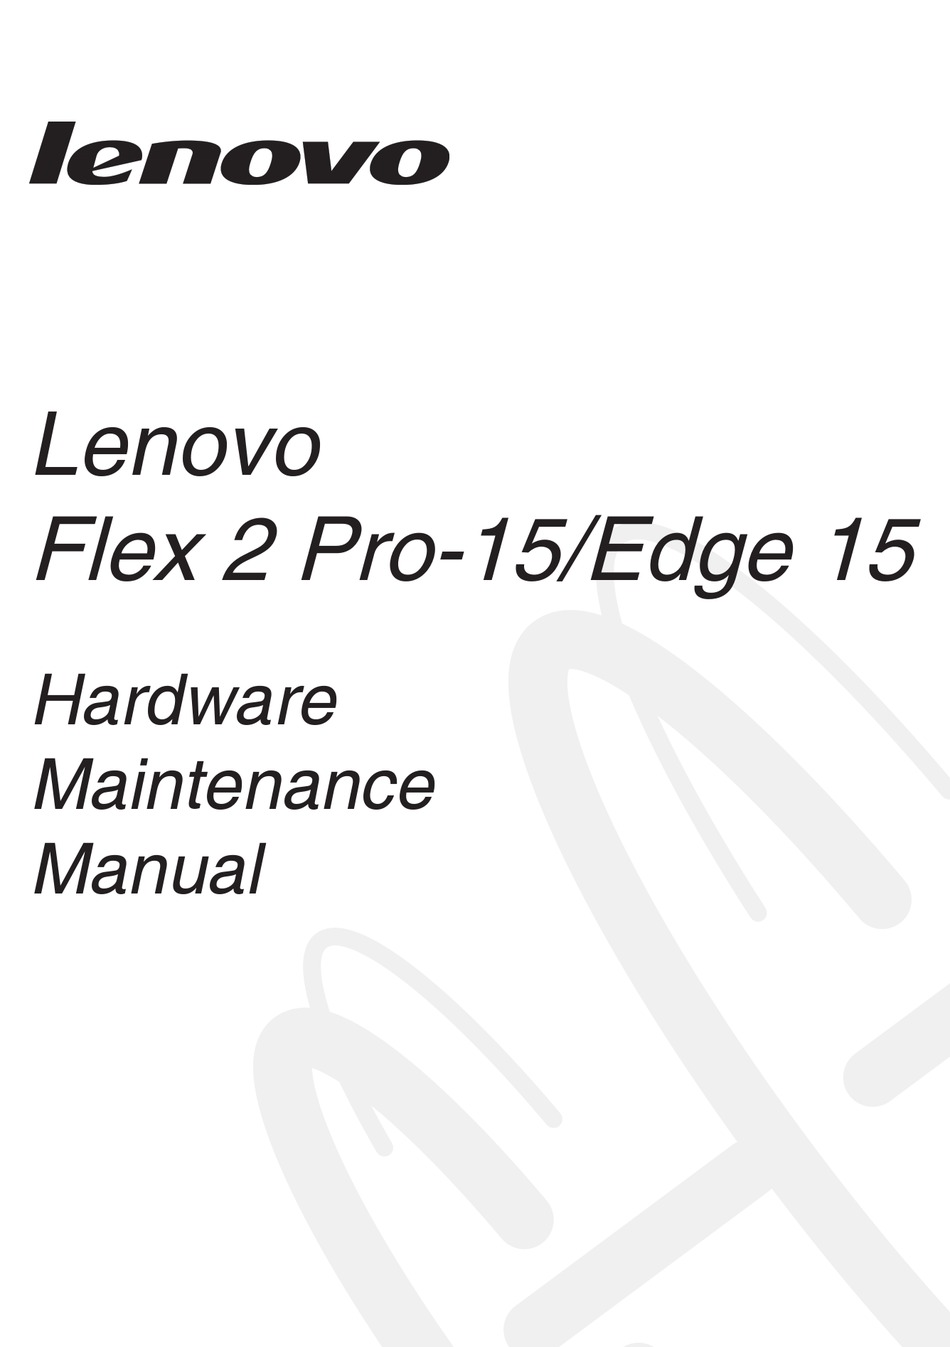 LENOVO FLEX 2 PRO-15 HARDWARE MAINTENANCE MANUAL Pdf